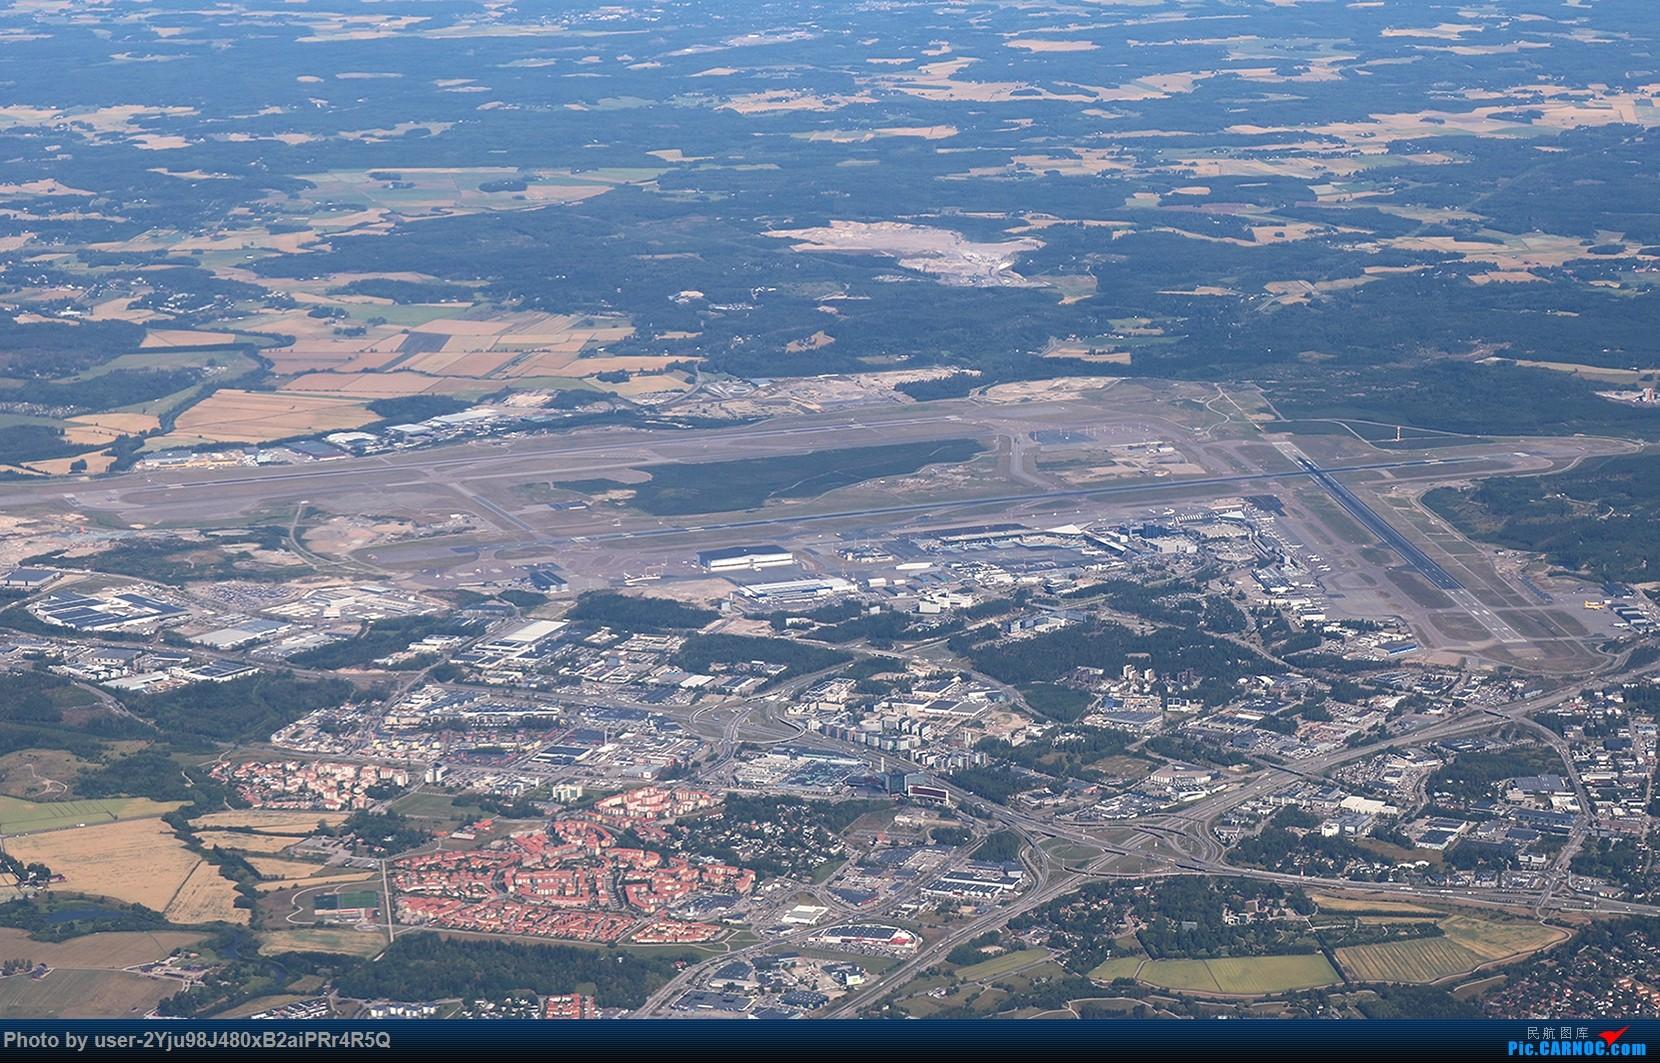 Re:[原创]LIULIU|一天两种机型三个国家四段航线五座城市的回家之路|西伯利亚上空的星光    芬兰赫尔辛基-万塔机场